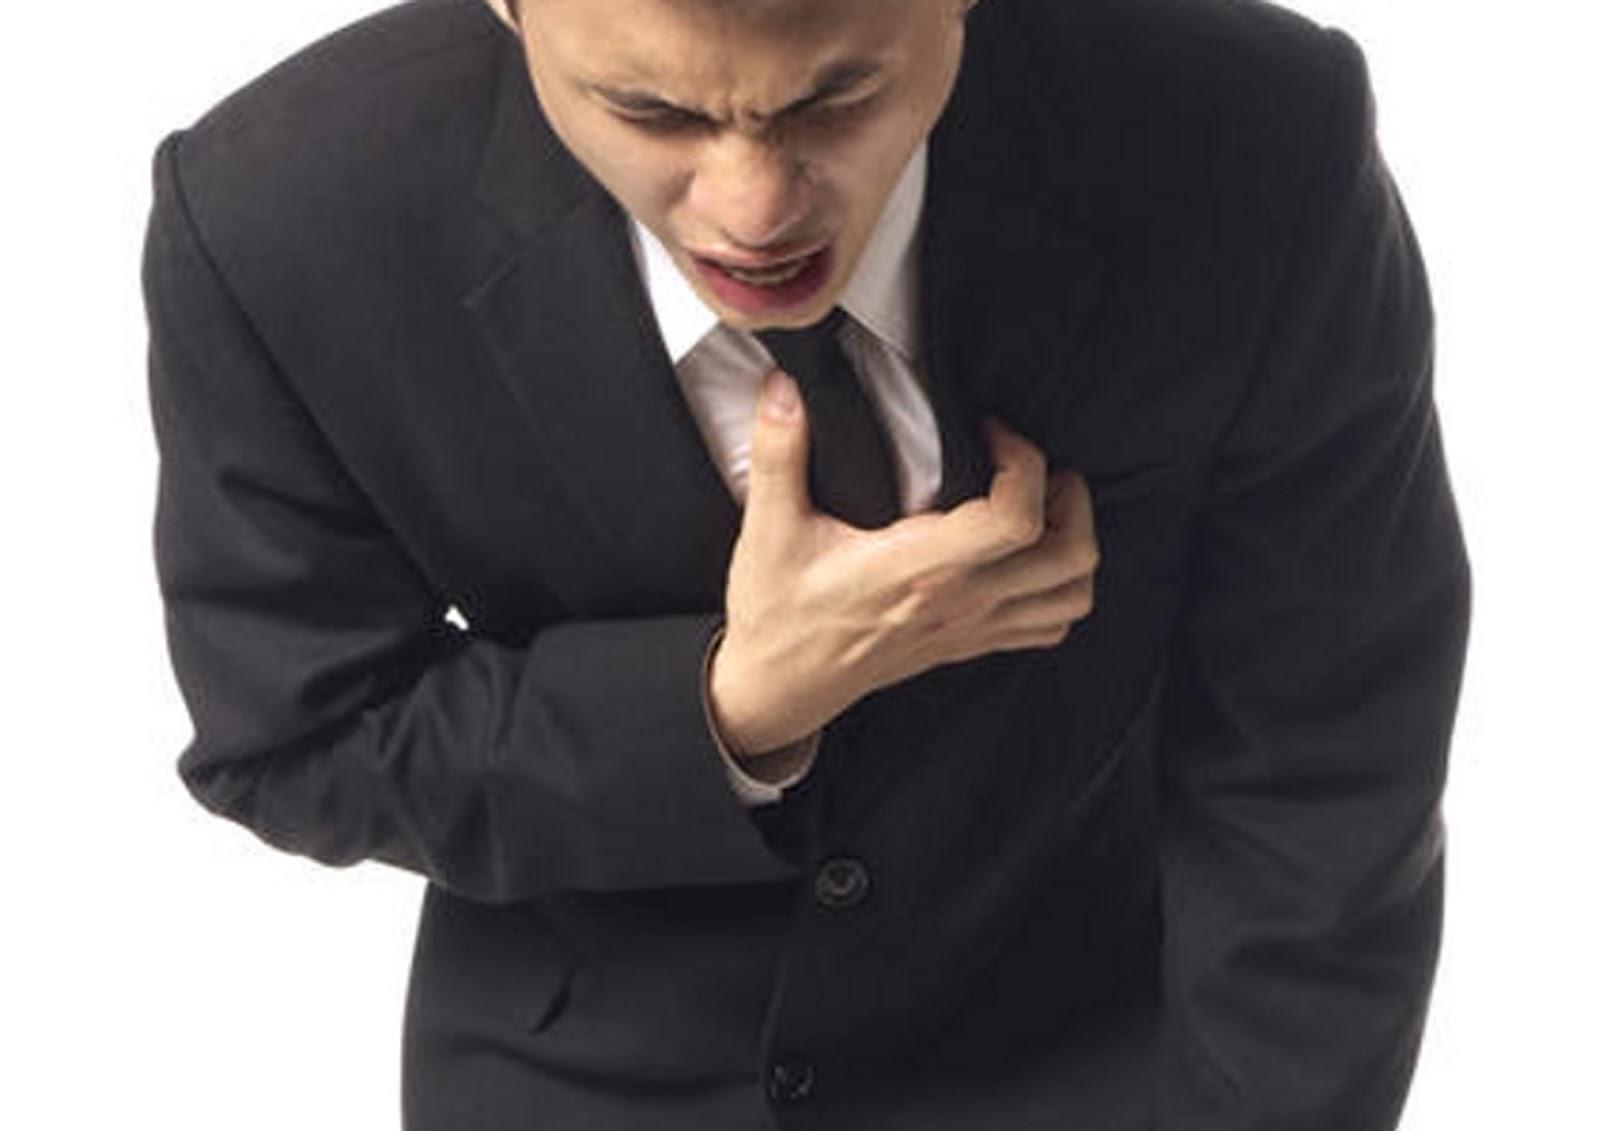 Hasil gambar untuk serangan jantung hd